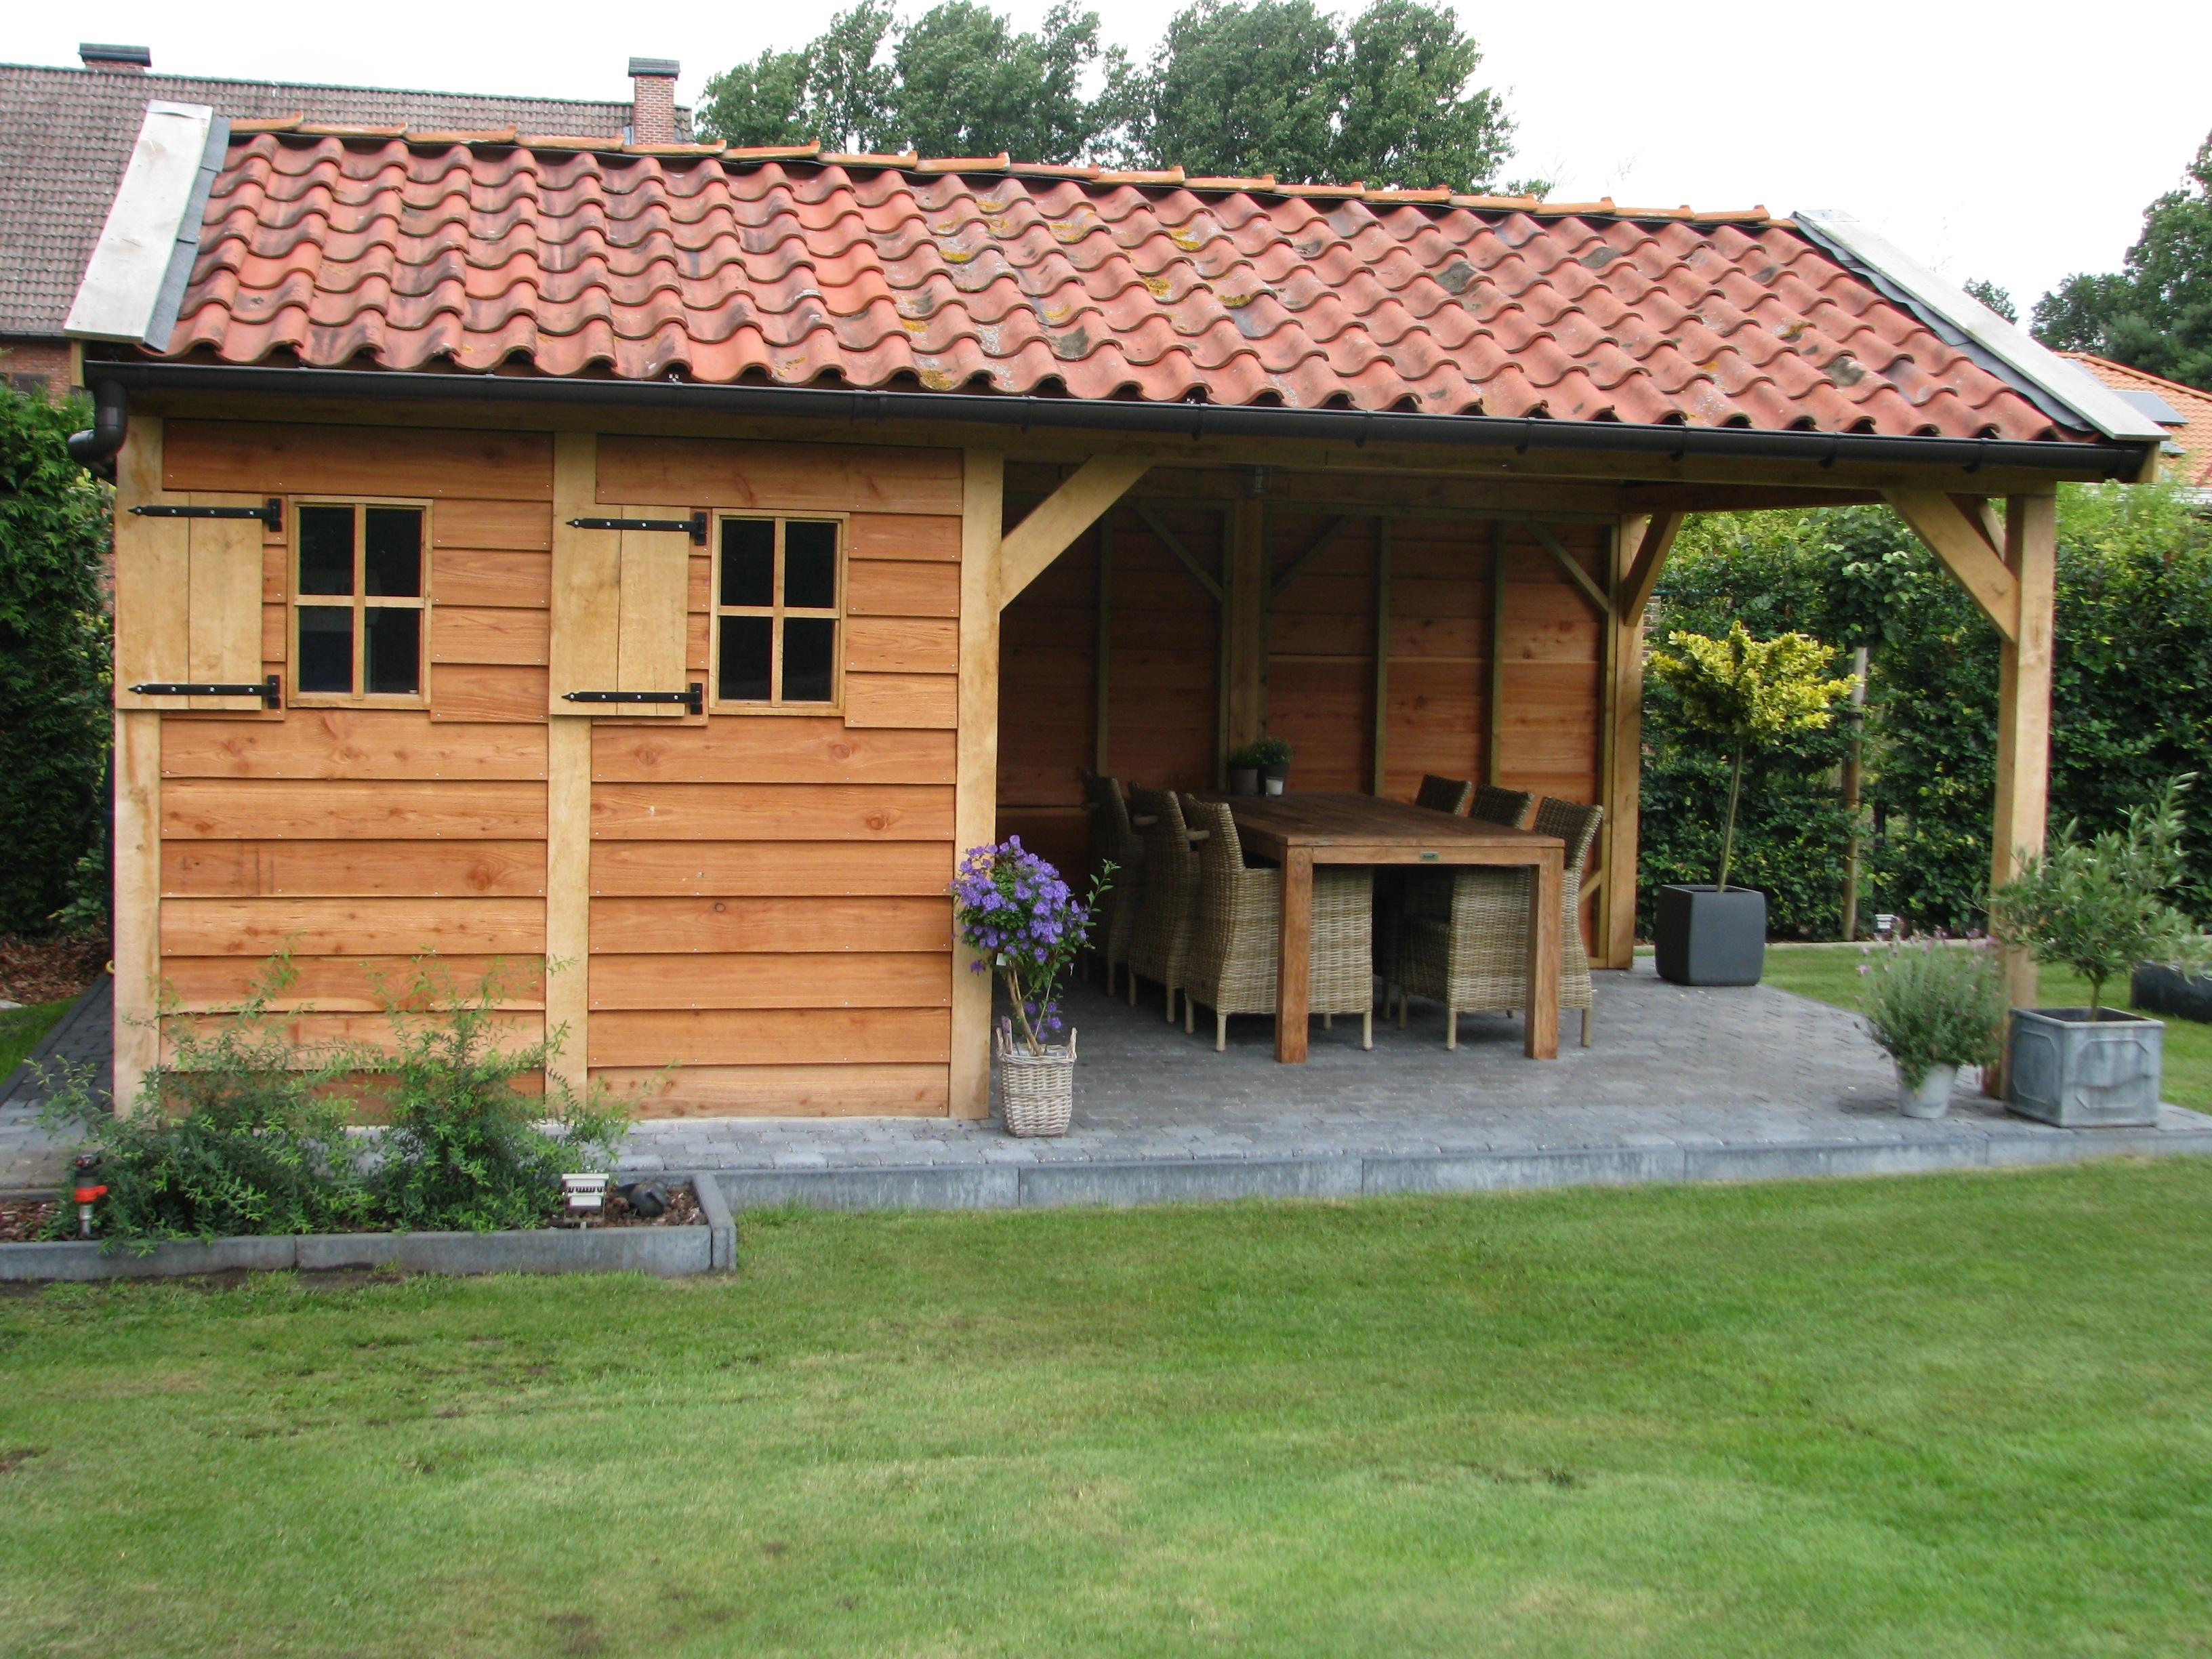 houten_tuinhuis_belgie_1 - Foto's van gerealiseerde tuinhuis met veranda in België.